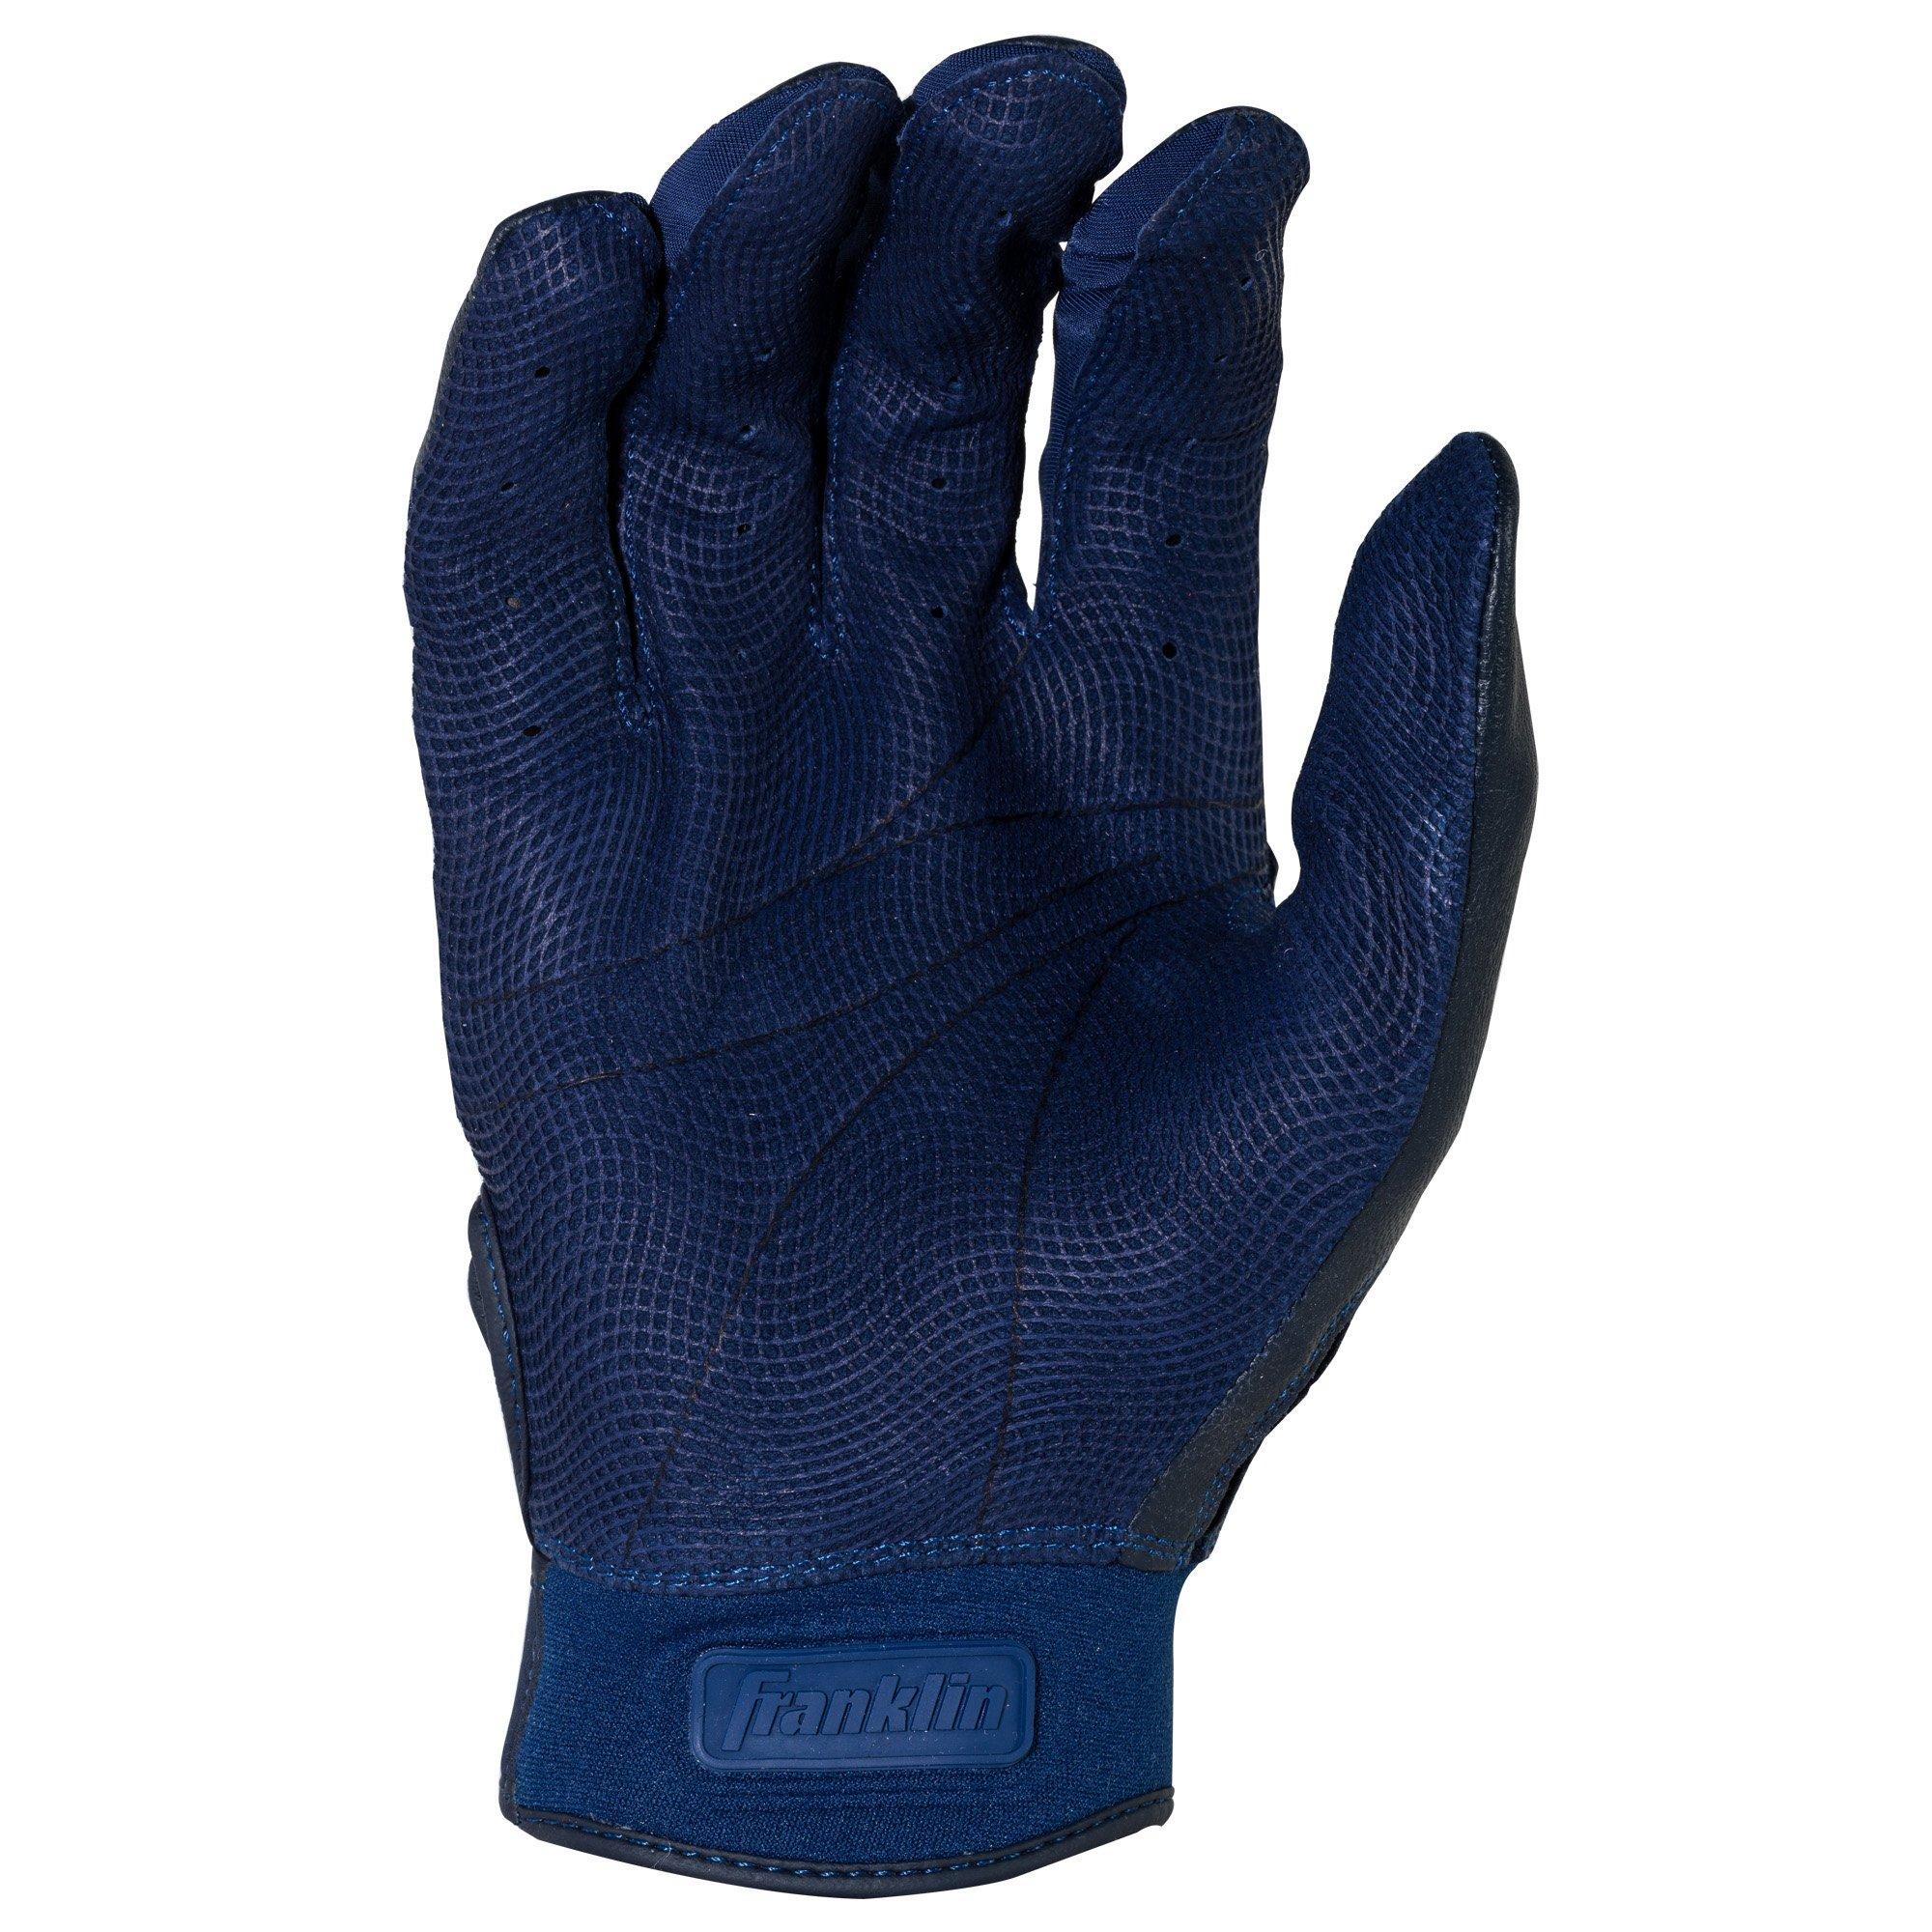 Franklin Sports CFX Pro Full Color Chrome Series Batting Gloves CFX Pro Full Color Chrome Batting Gloves, Navy, Adult Small by Franklin Sports (Image #3)